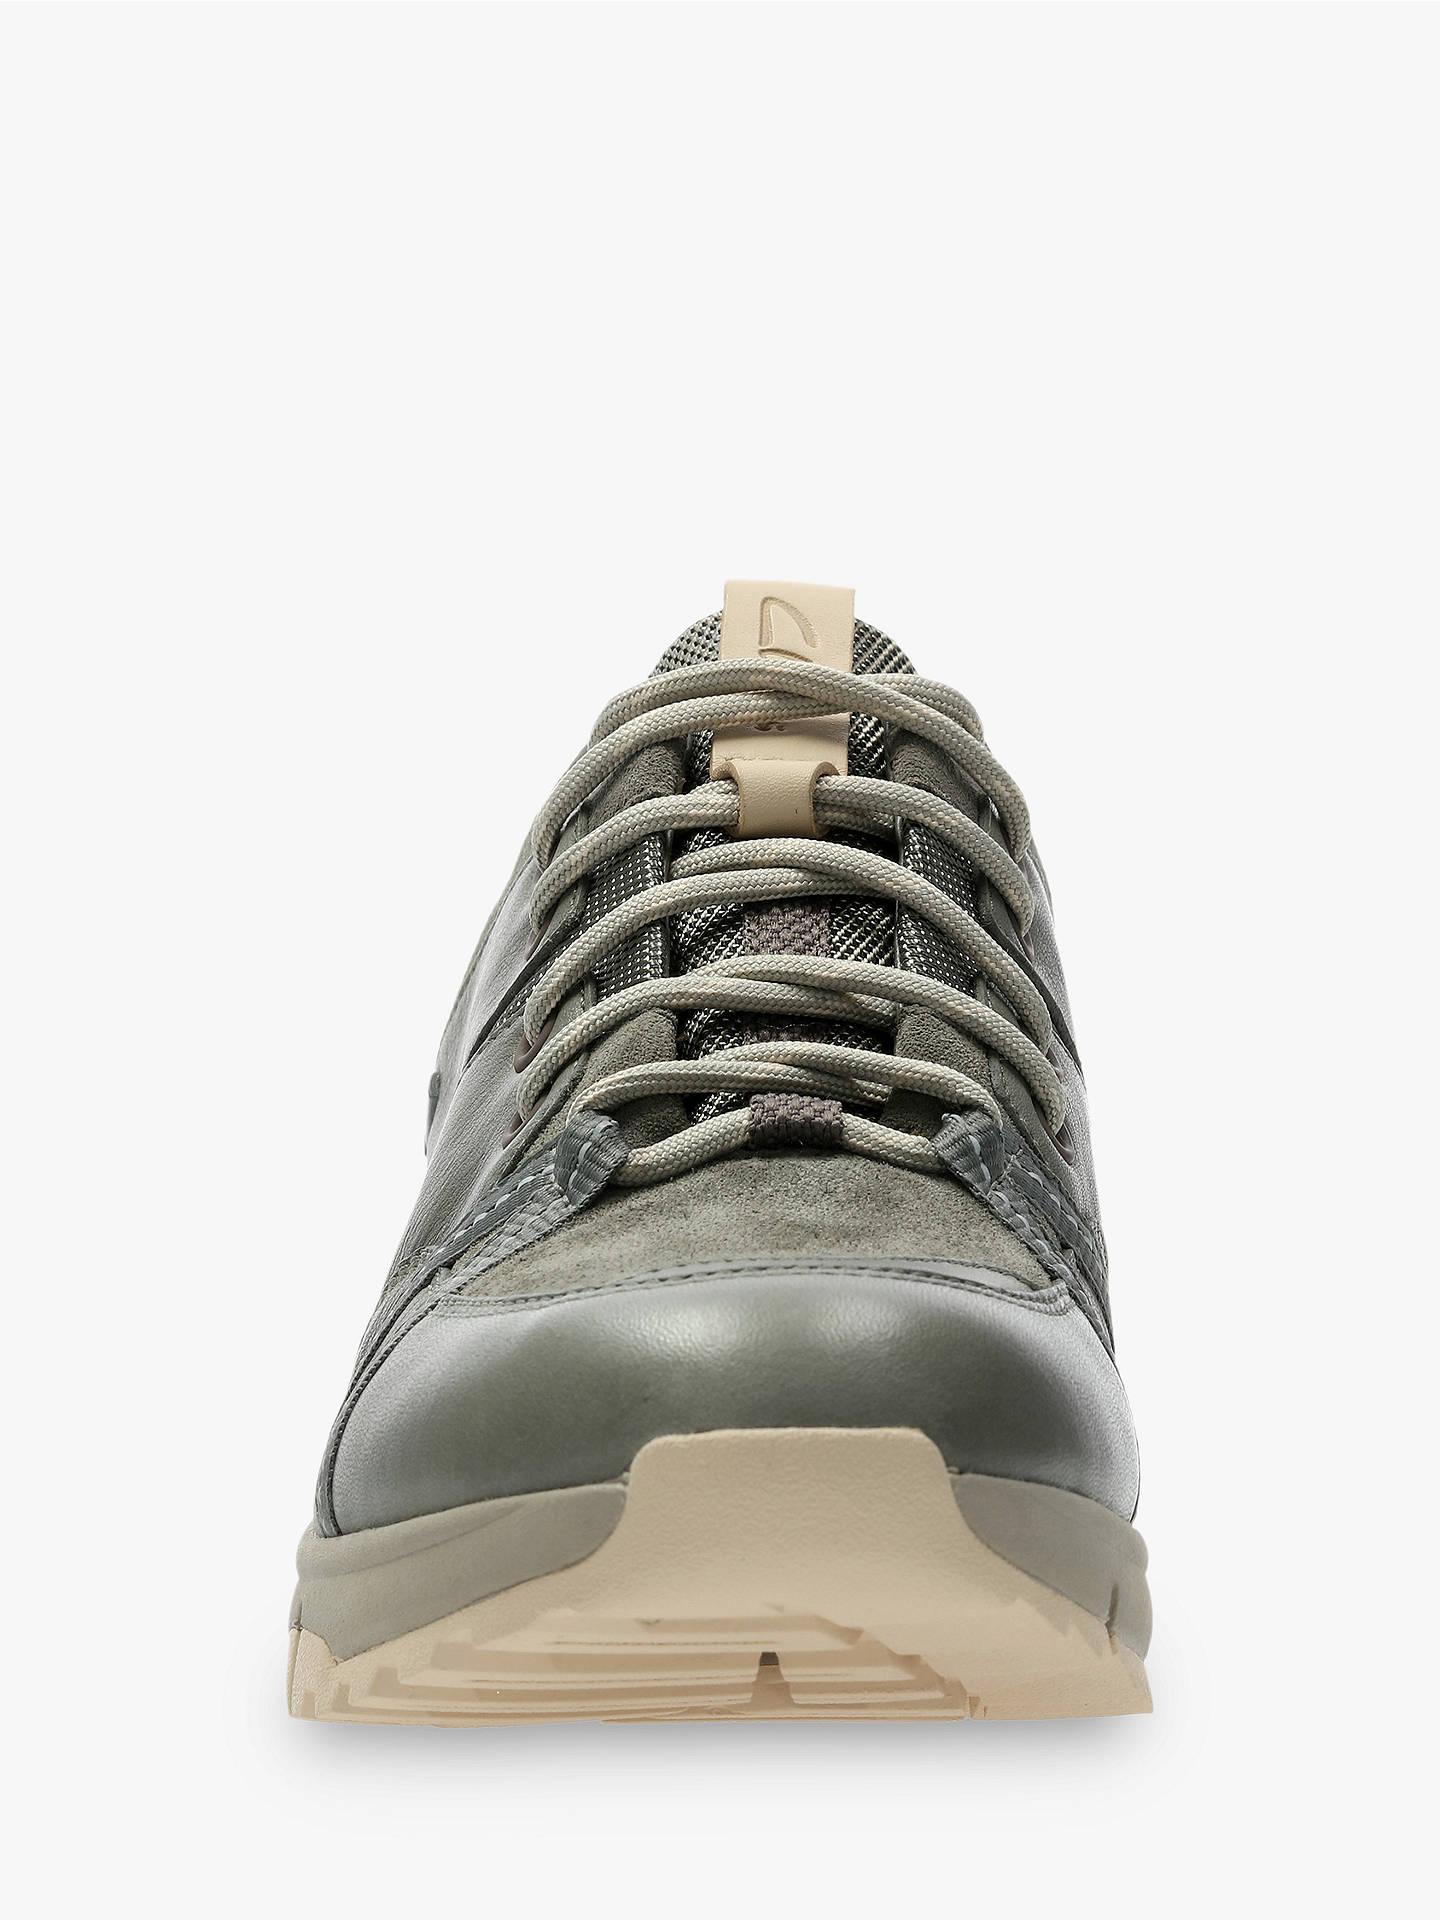 4c324ef9 ... Buy Clarks Tri Trek GORE-TEX Trainers, Khaki Leather, 3 Online at  johnlewis ...